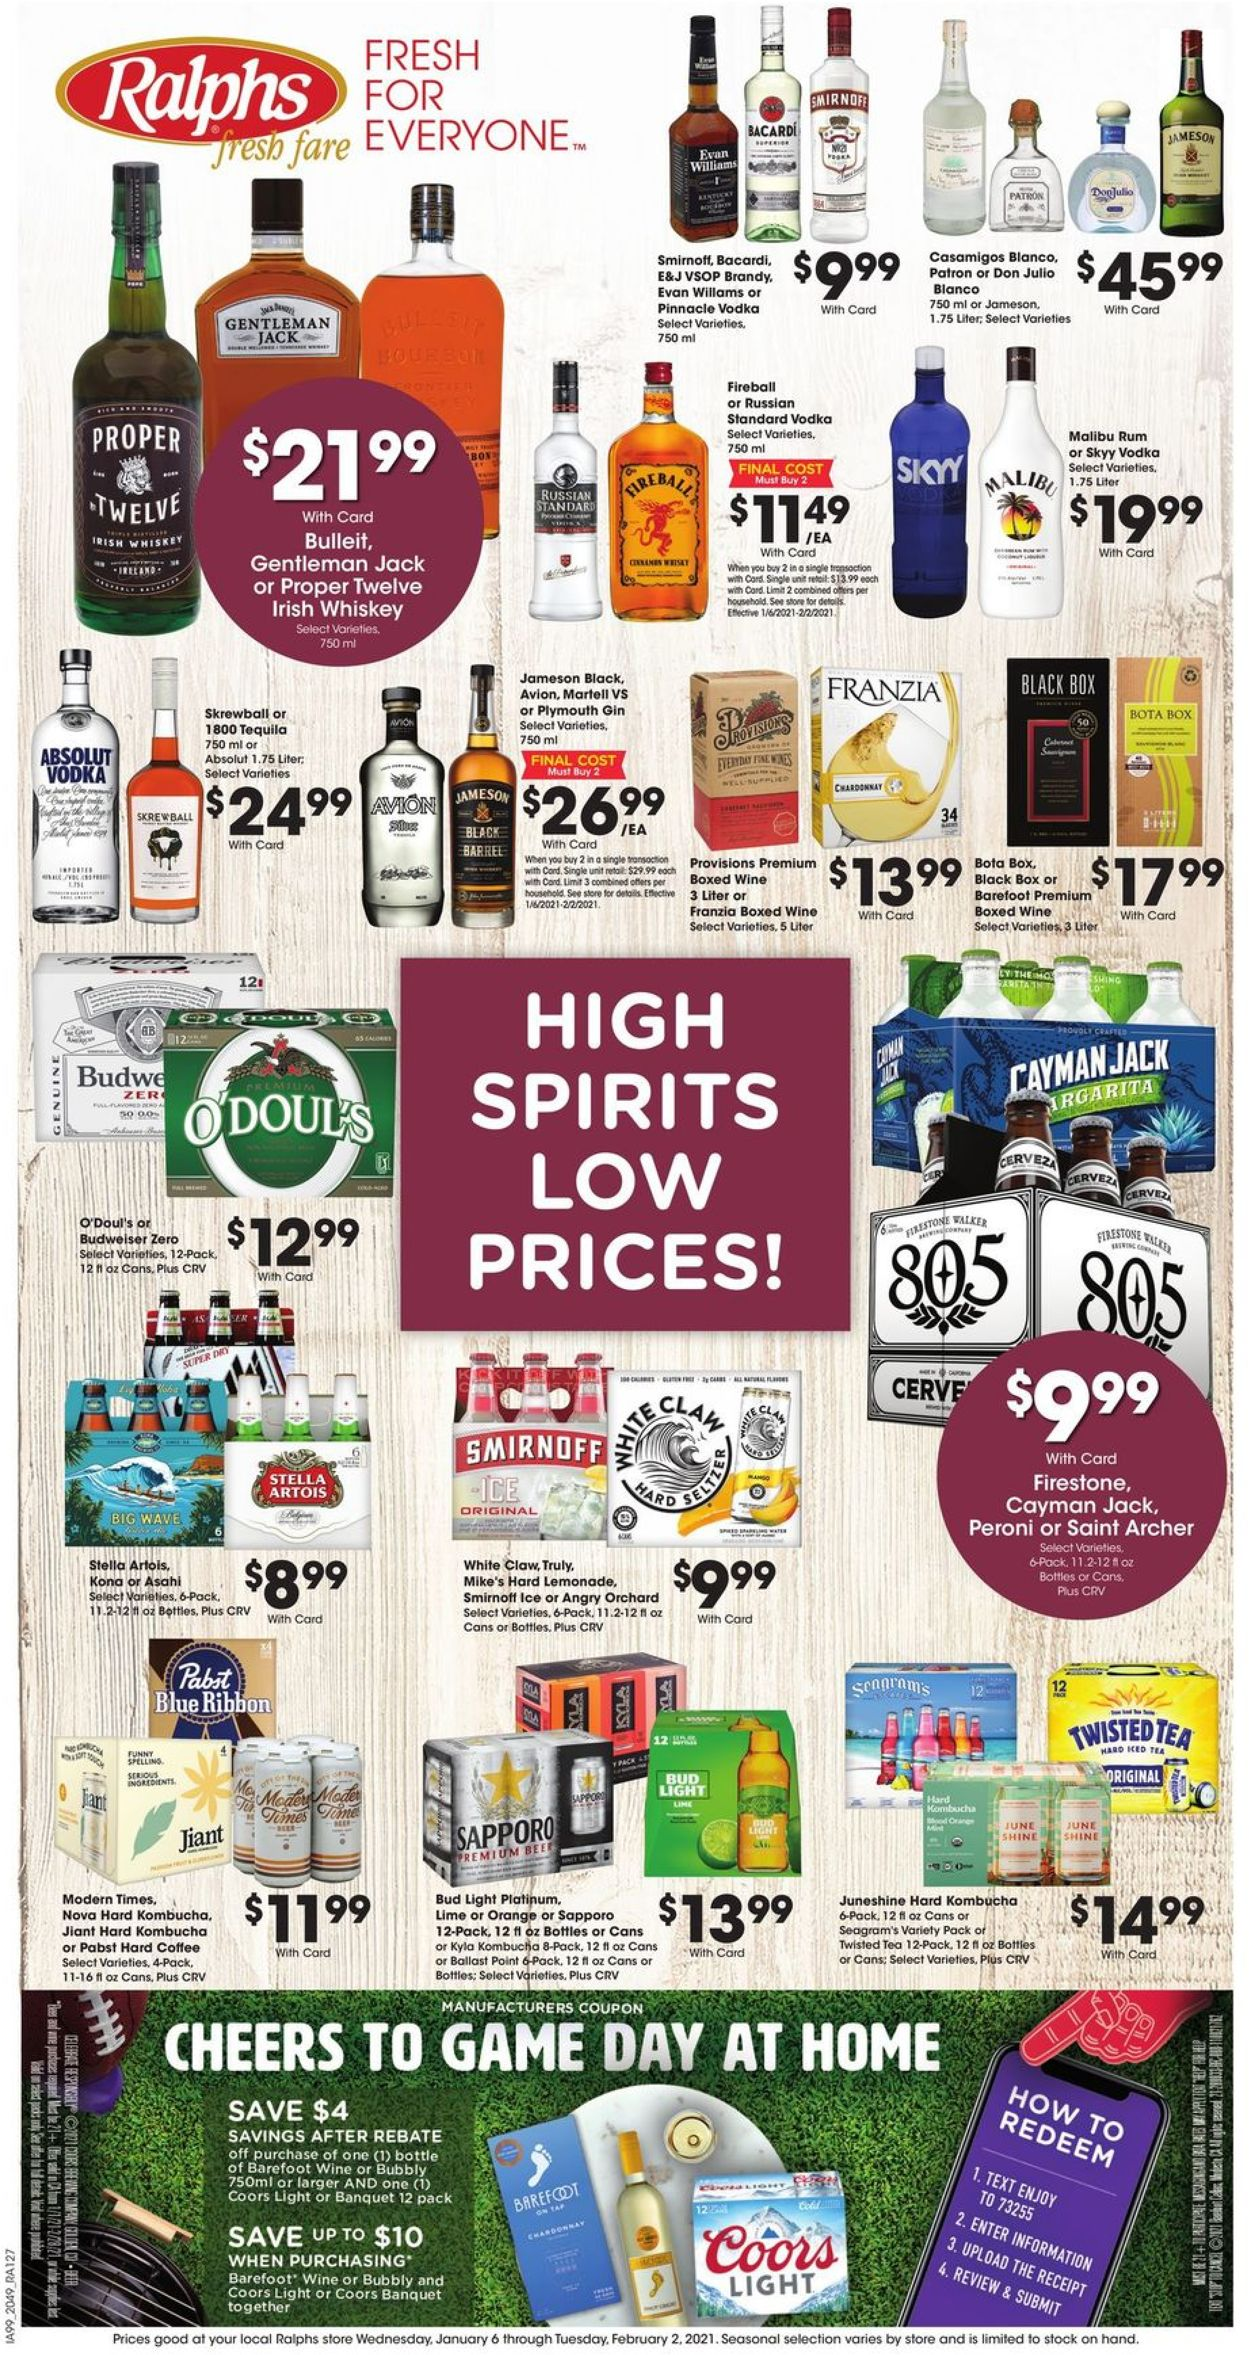 Ralphs High Spirits, Low Prices 2021 Weekly Ad Circular - valid 01/06-02/02/2021